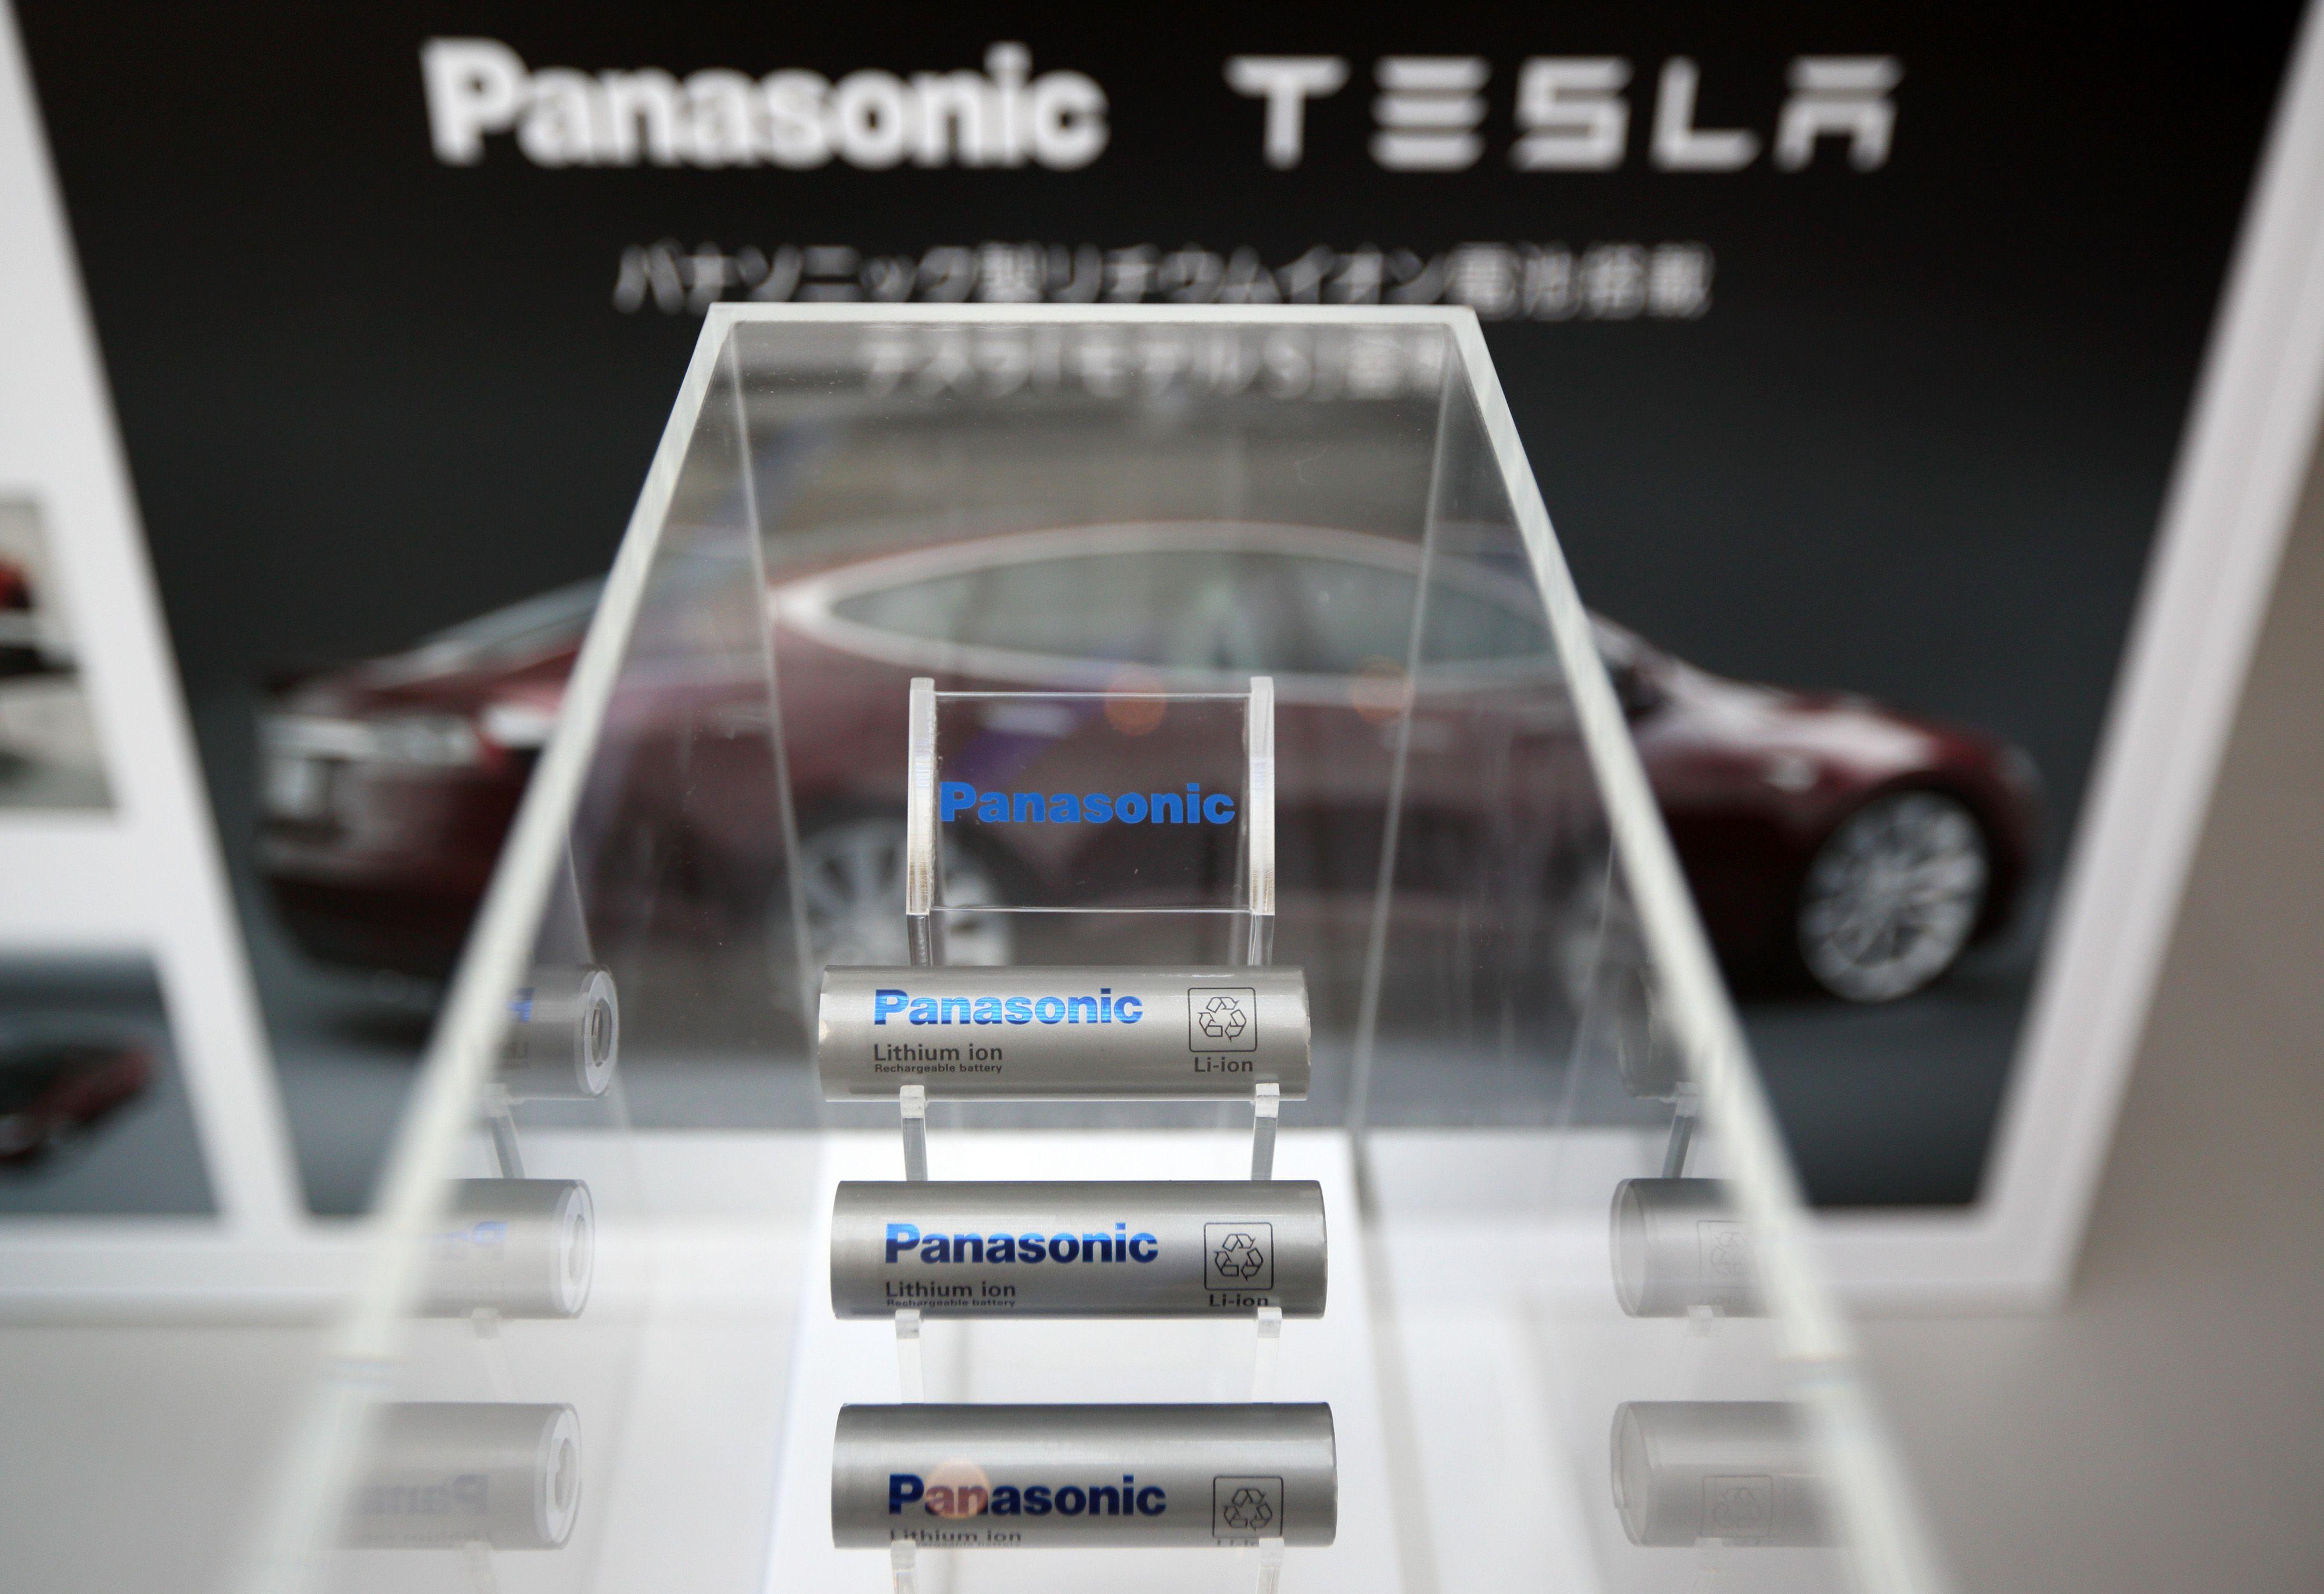 Panasonic tesla partnership